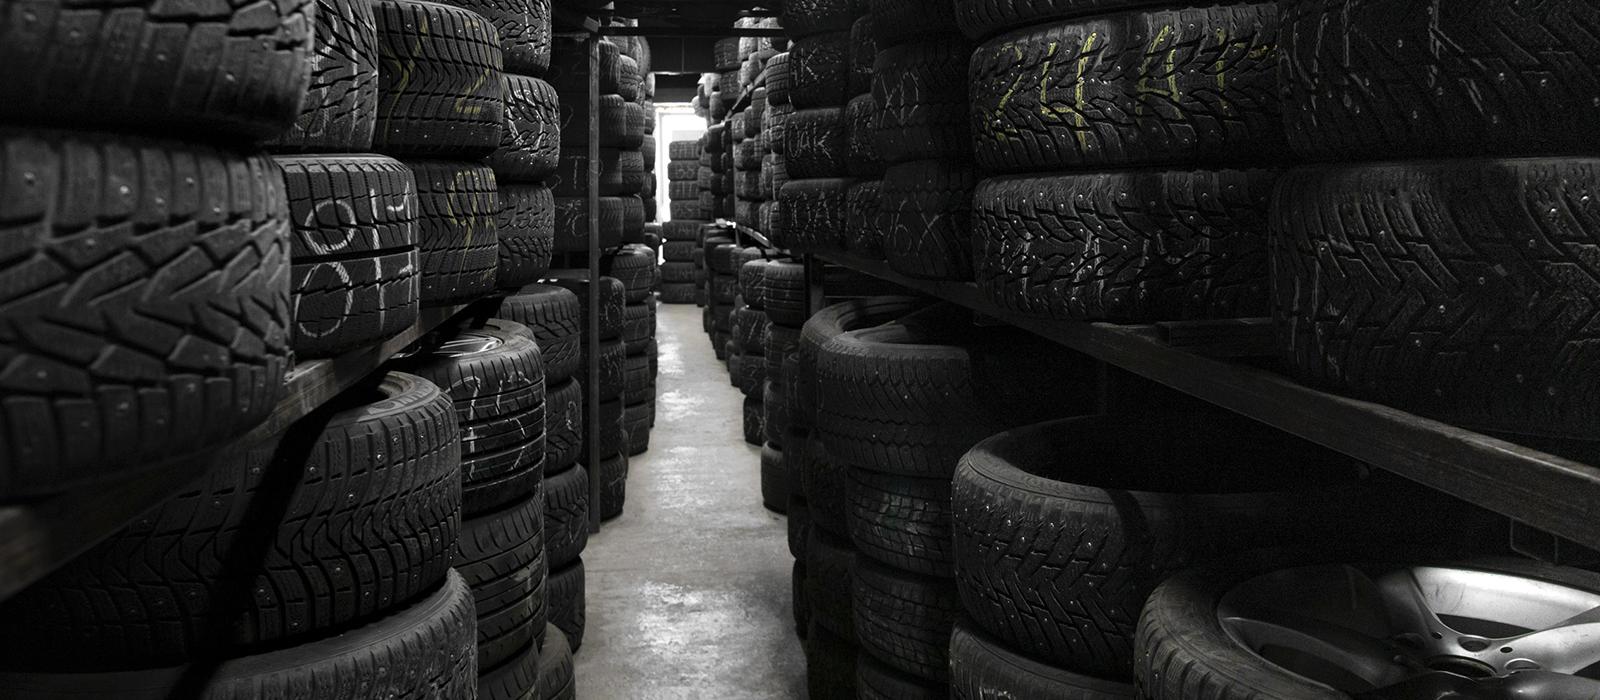 Сезонное хранение колёс цена